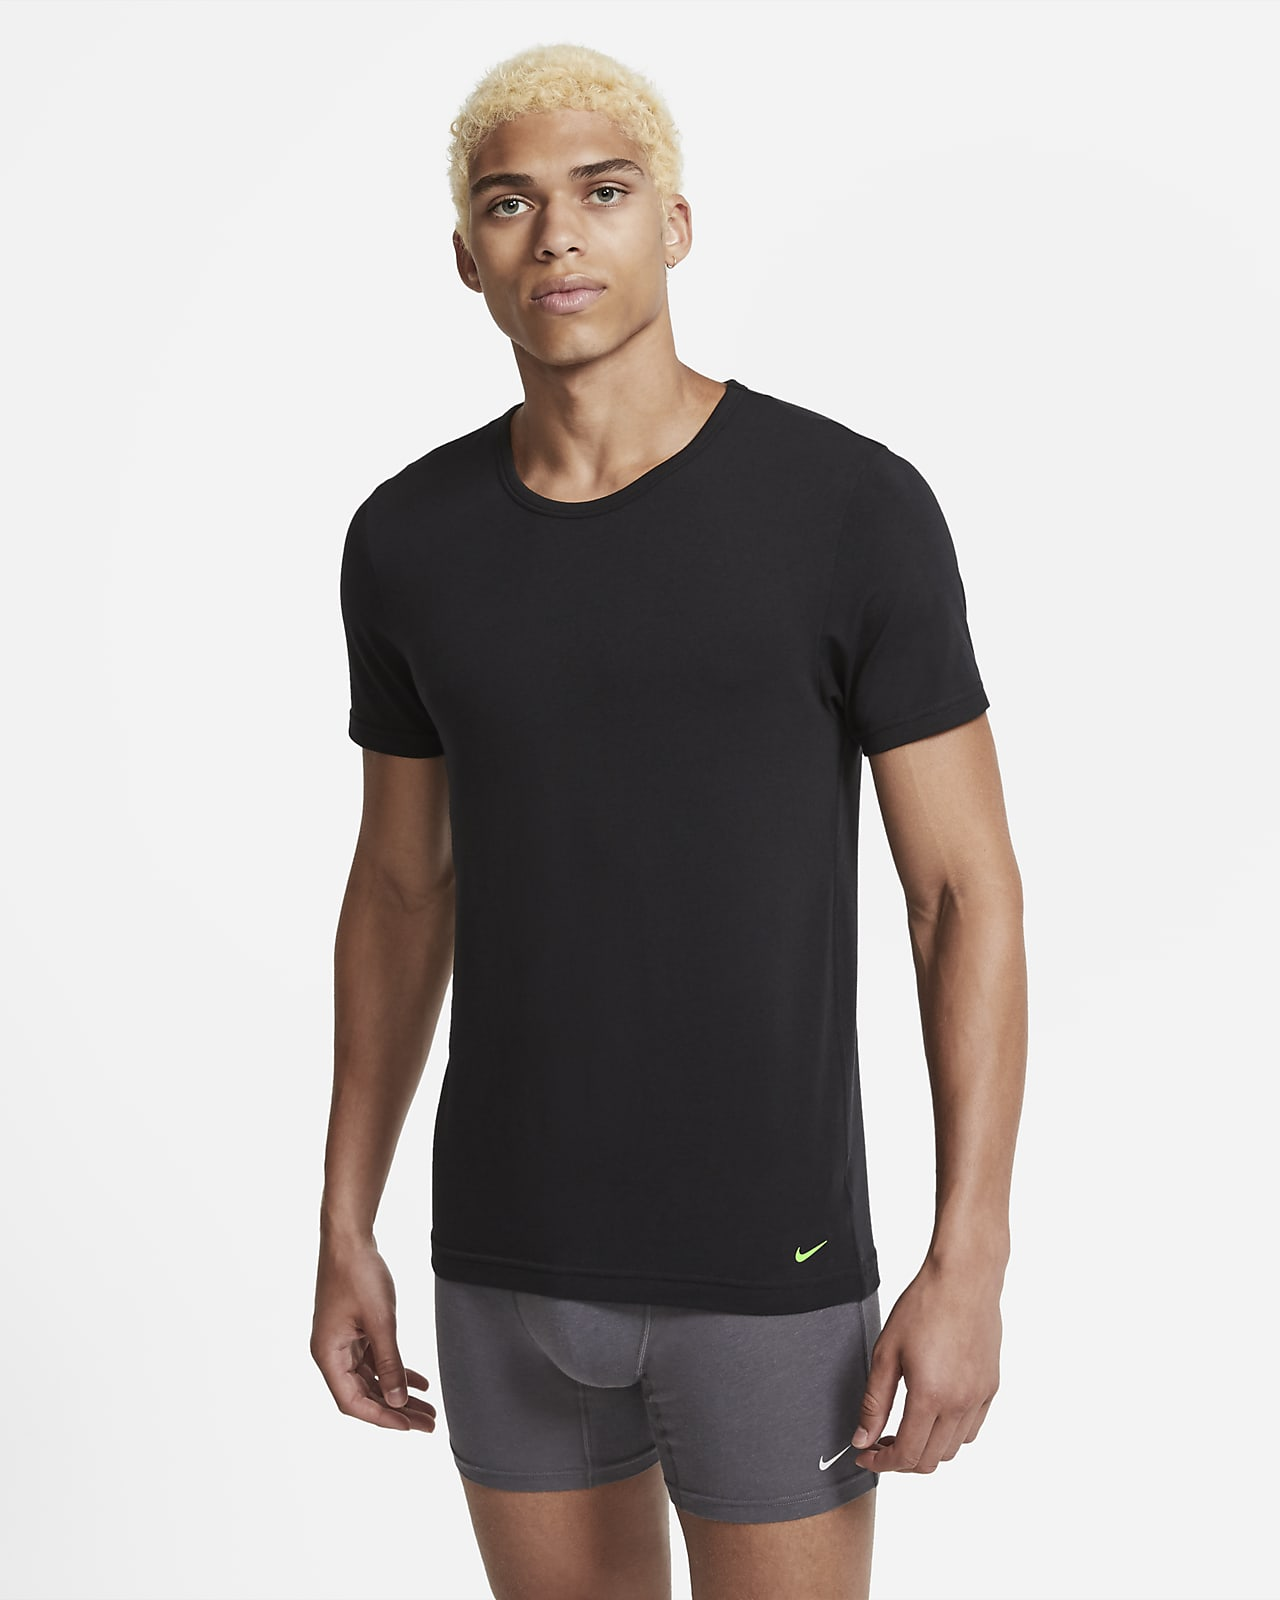 Nike Luxe Cotton Modal Men's Slim Fit Crew-Neck Undershirt (2-Pack)